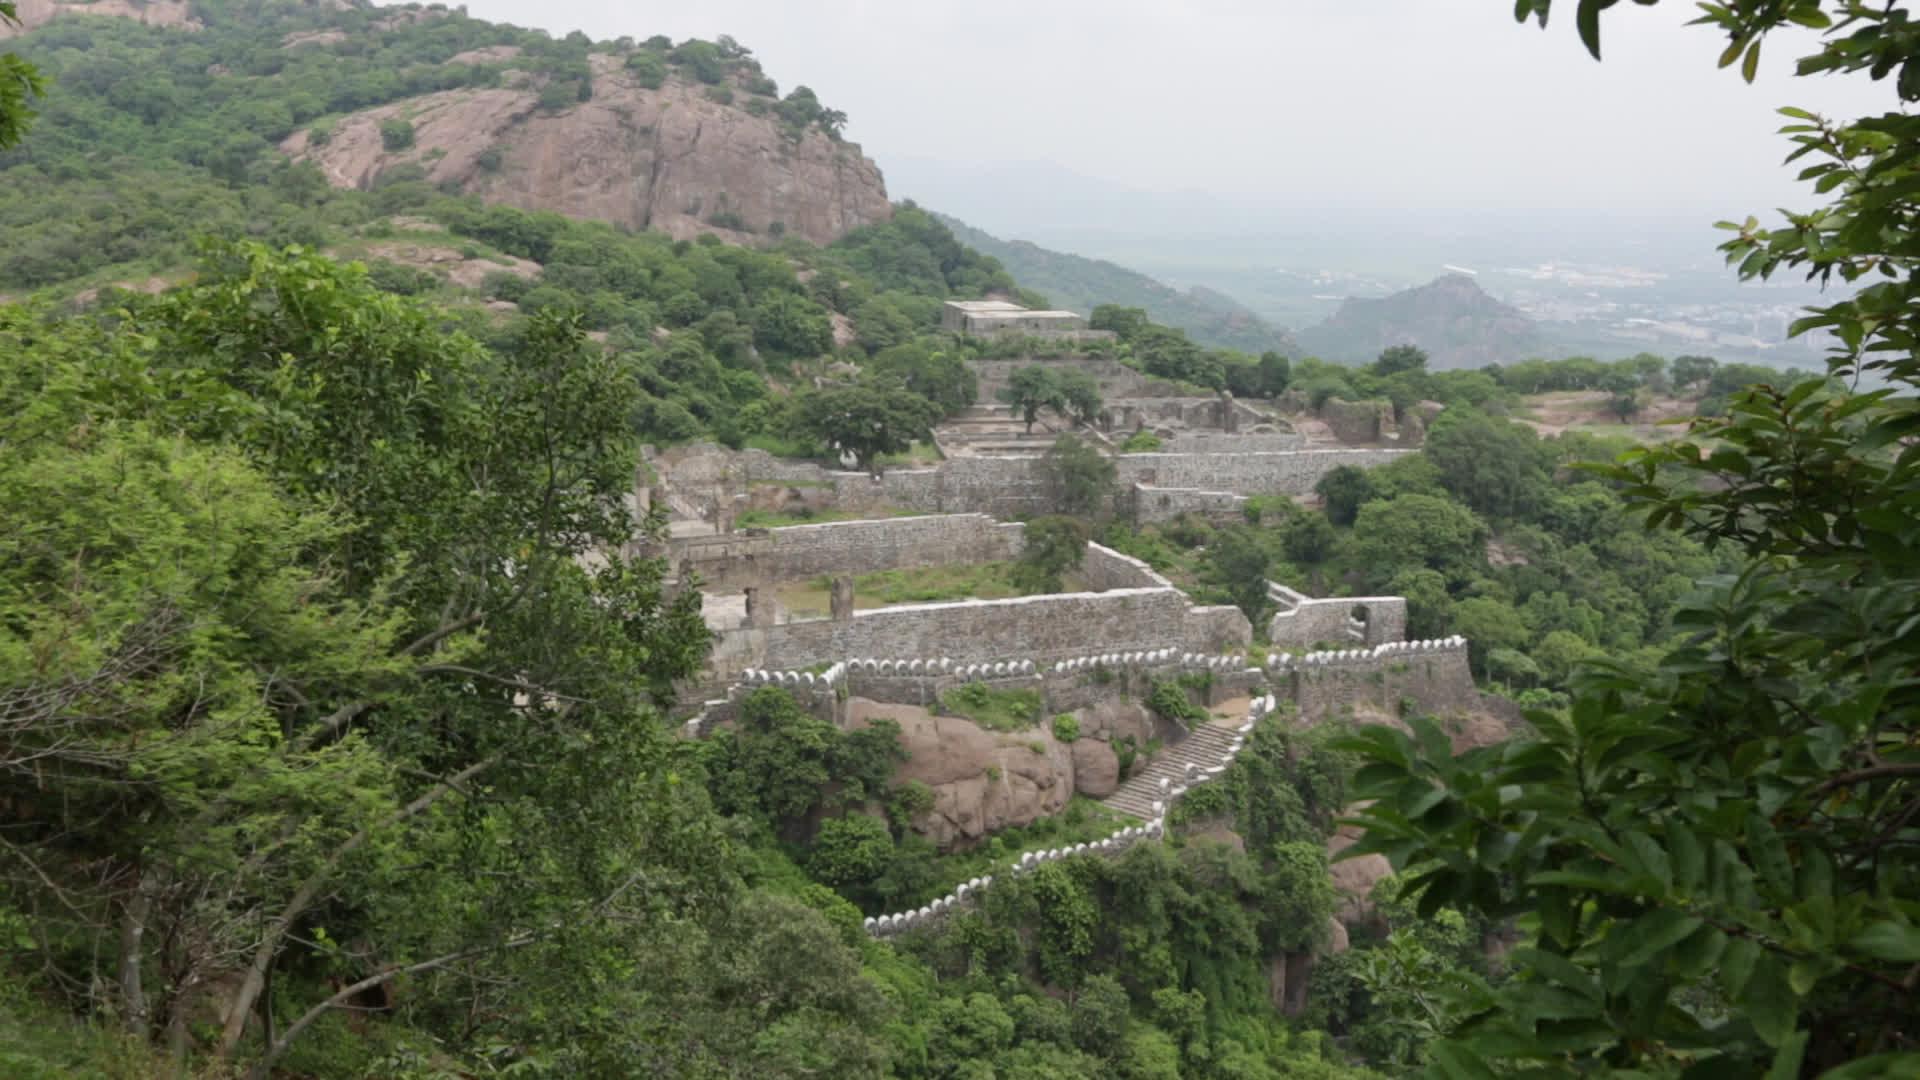 The King-sized Fort of Kondapalli